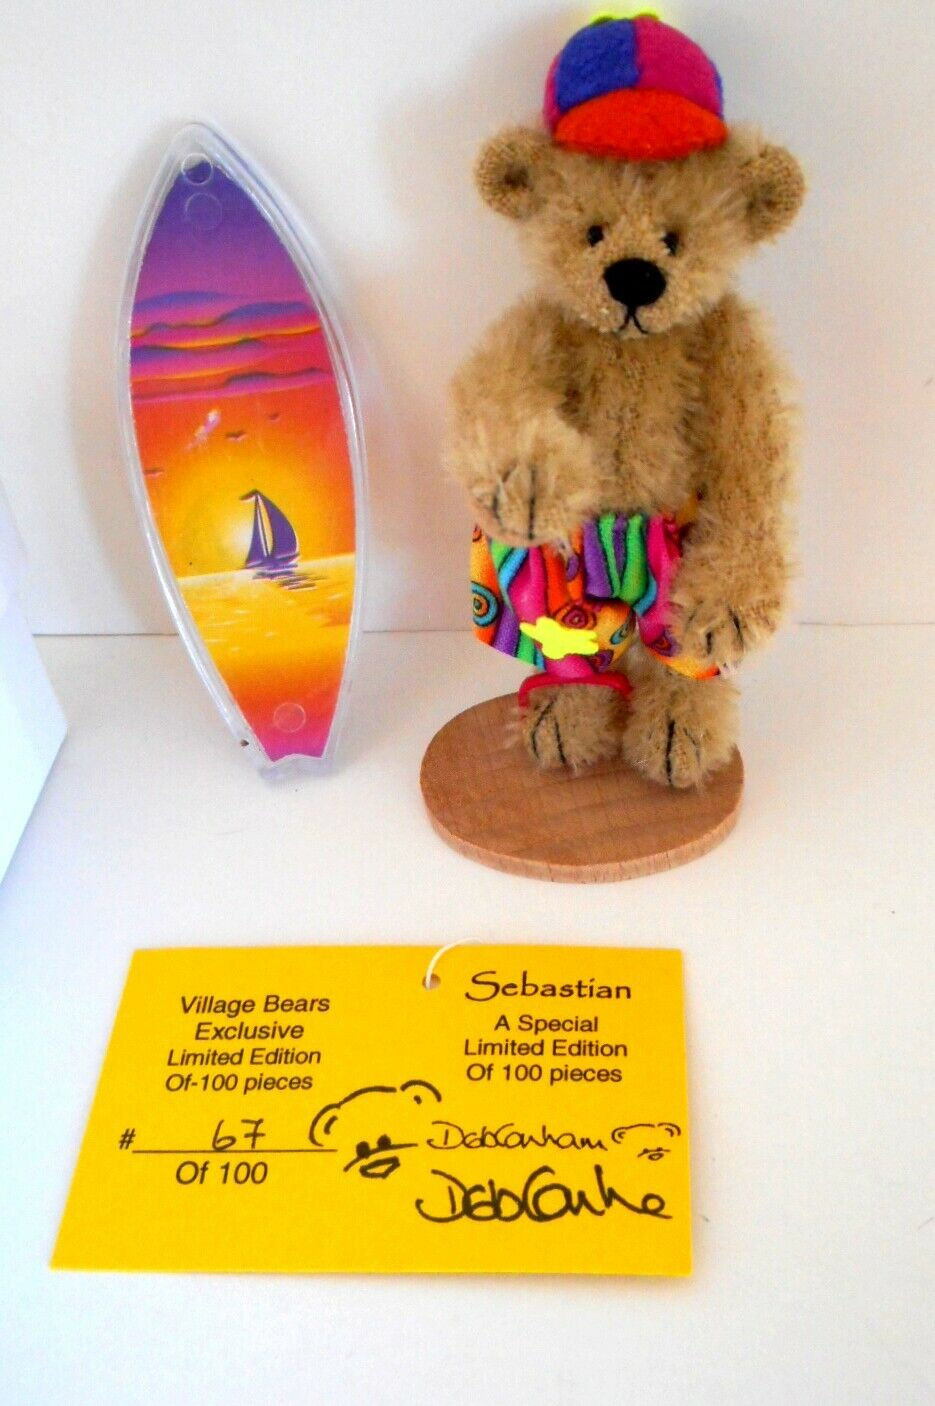 DEB CANHAM Sebastian Surfer Bear Ltd. Ed. From Village Bears 67 100 MIB 2003